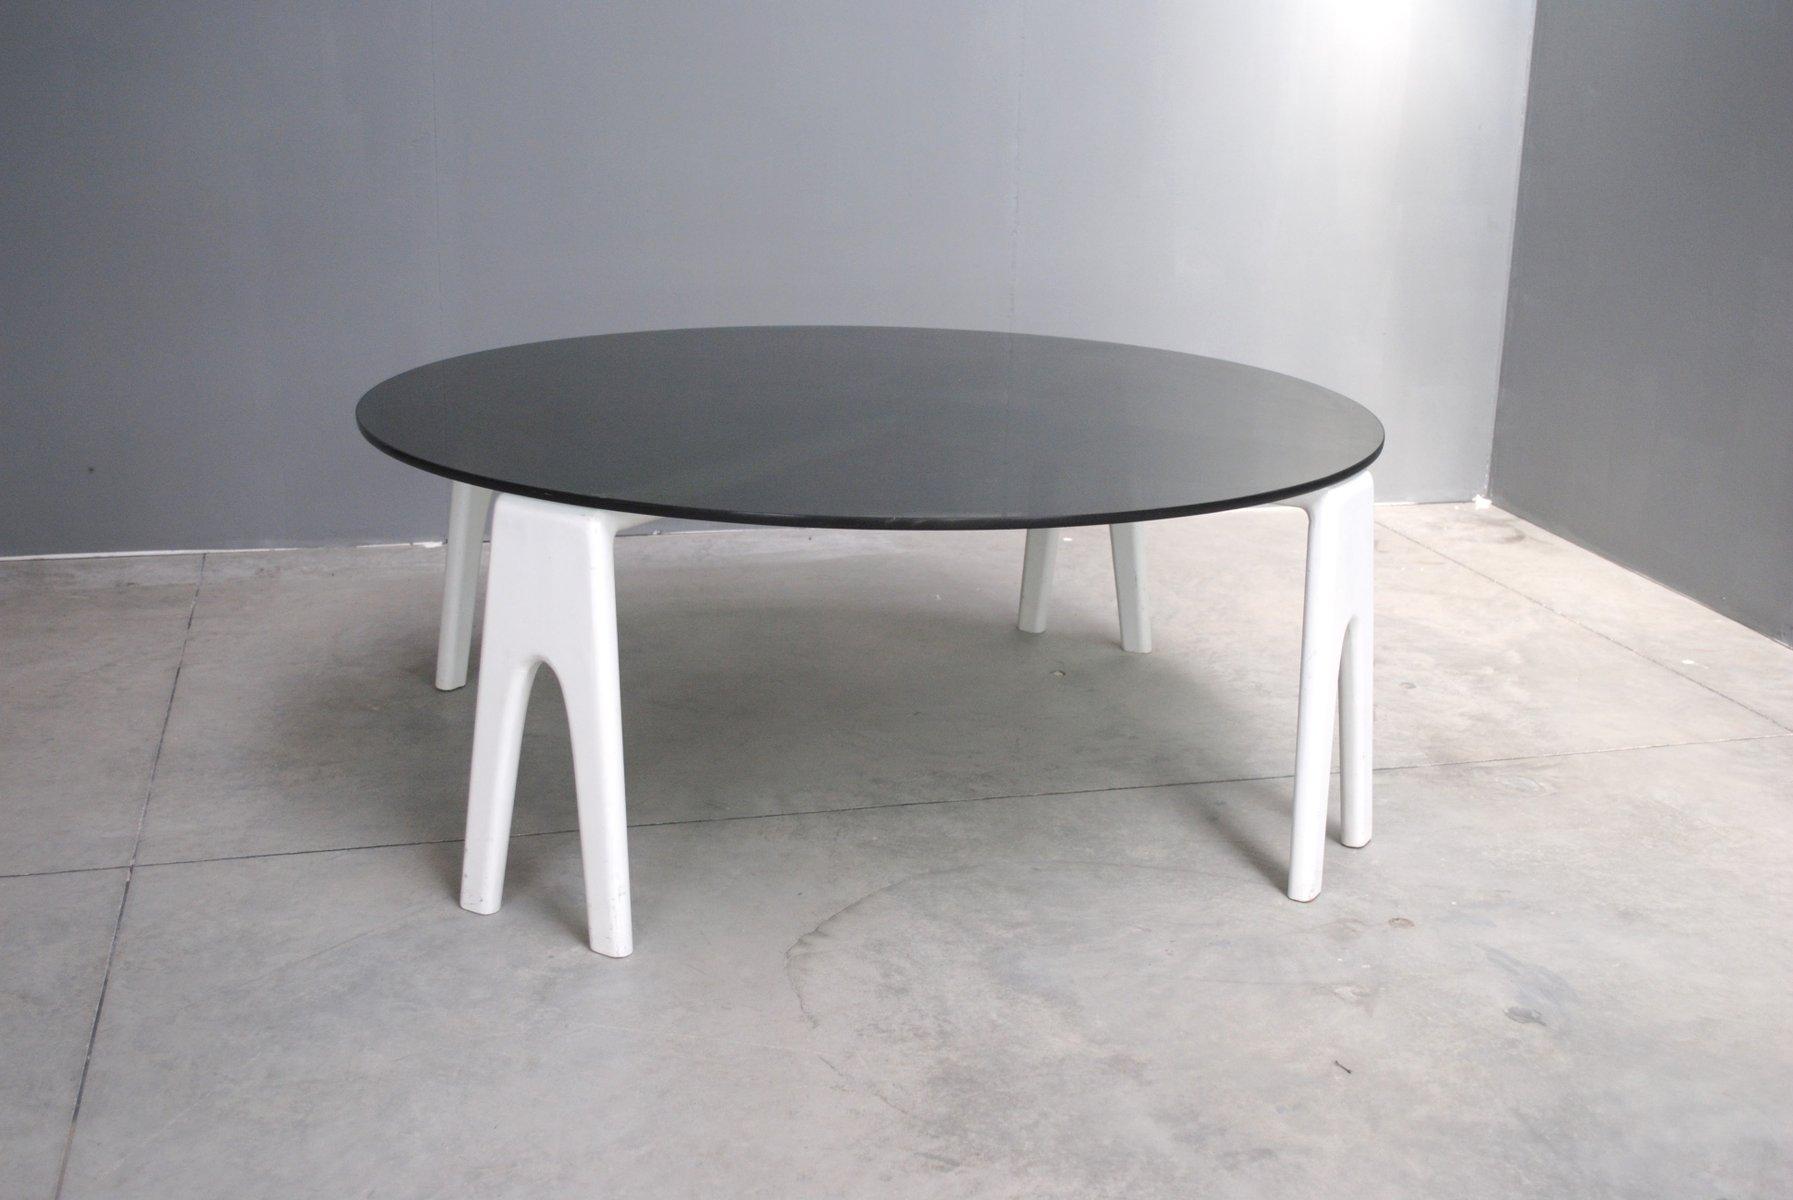 table basse en verre design italien excellent table basse carre en verre par tobia scarpa pour. Black Bedroom Furniture Sets. Home Design Ideas